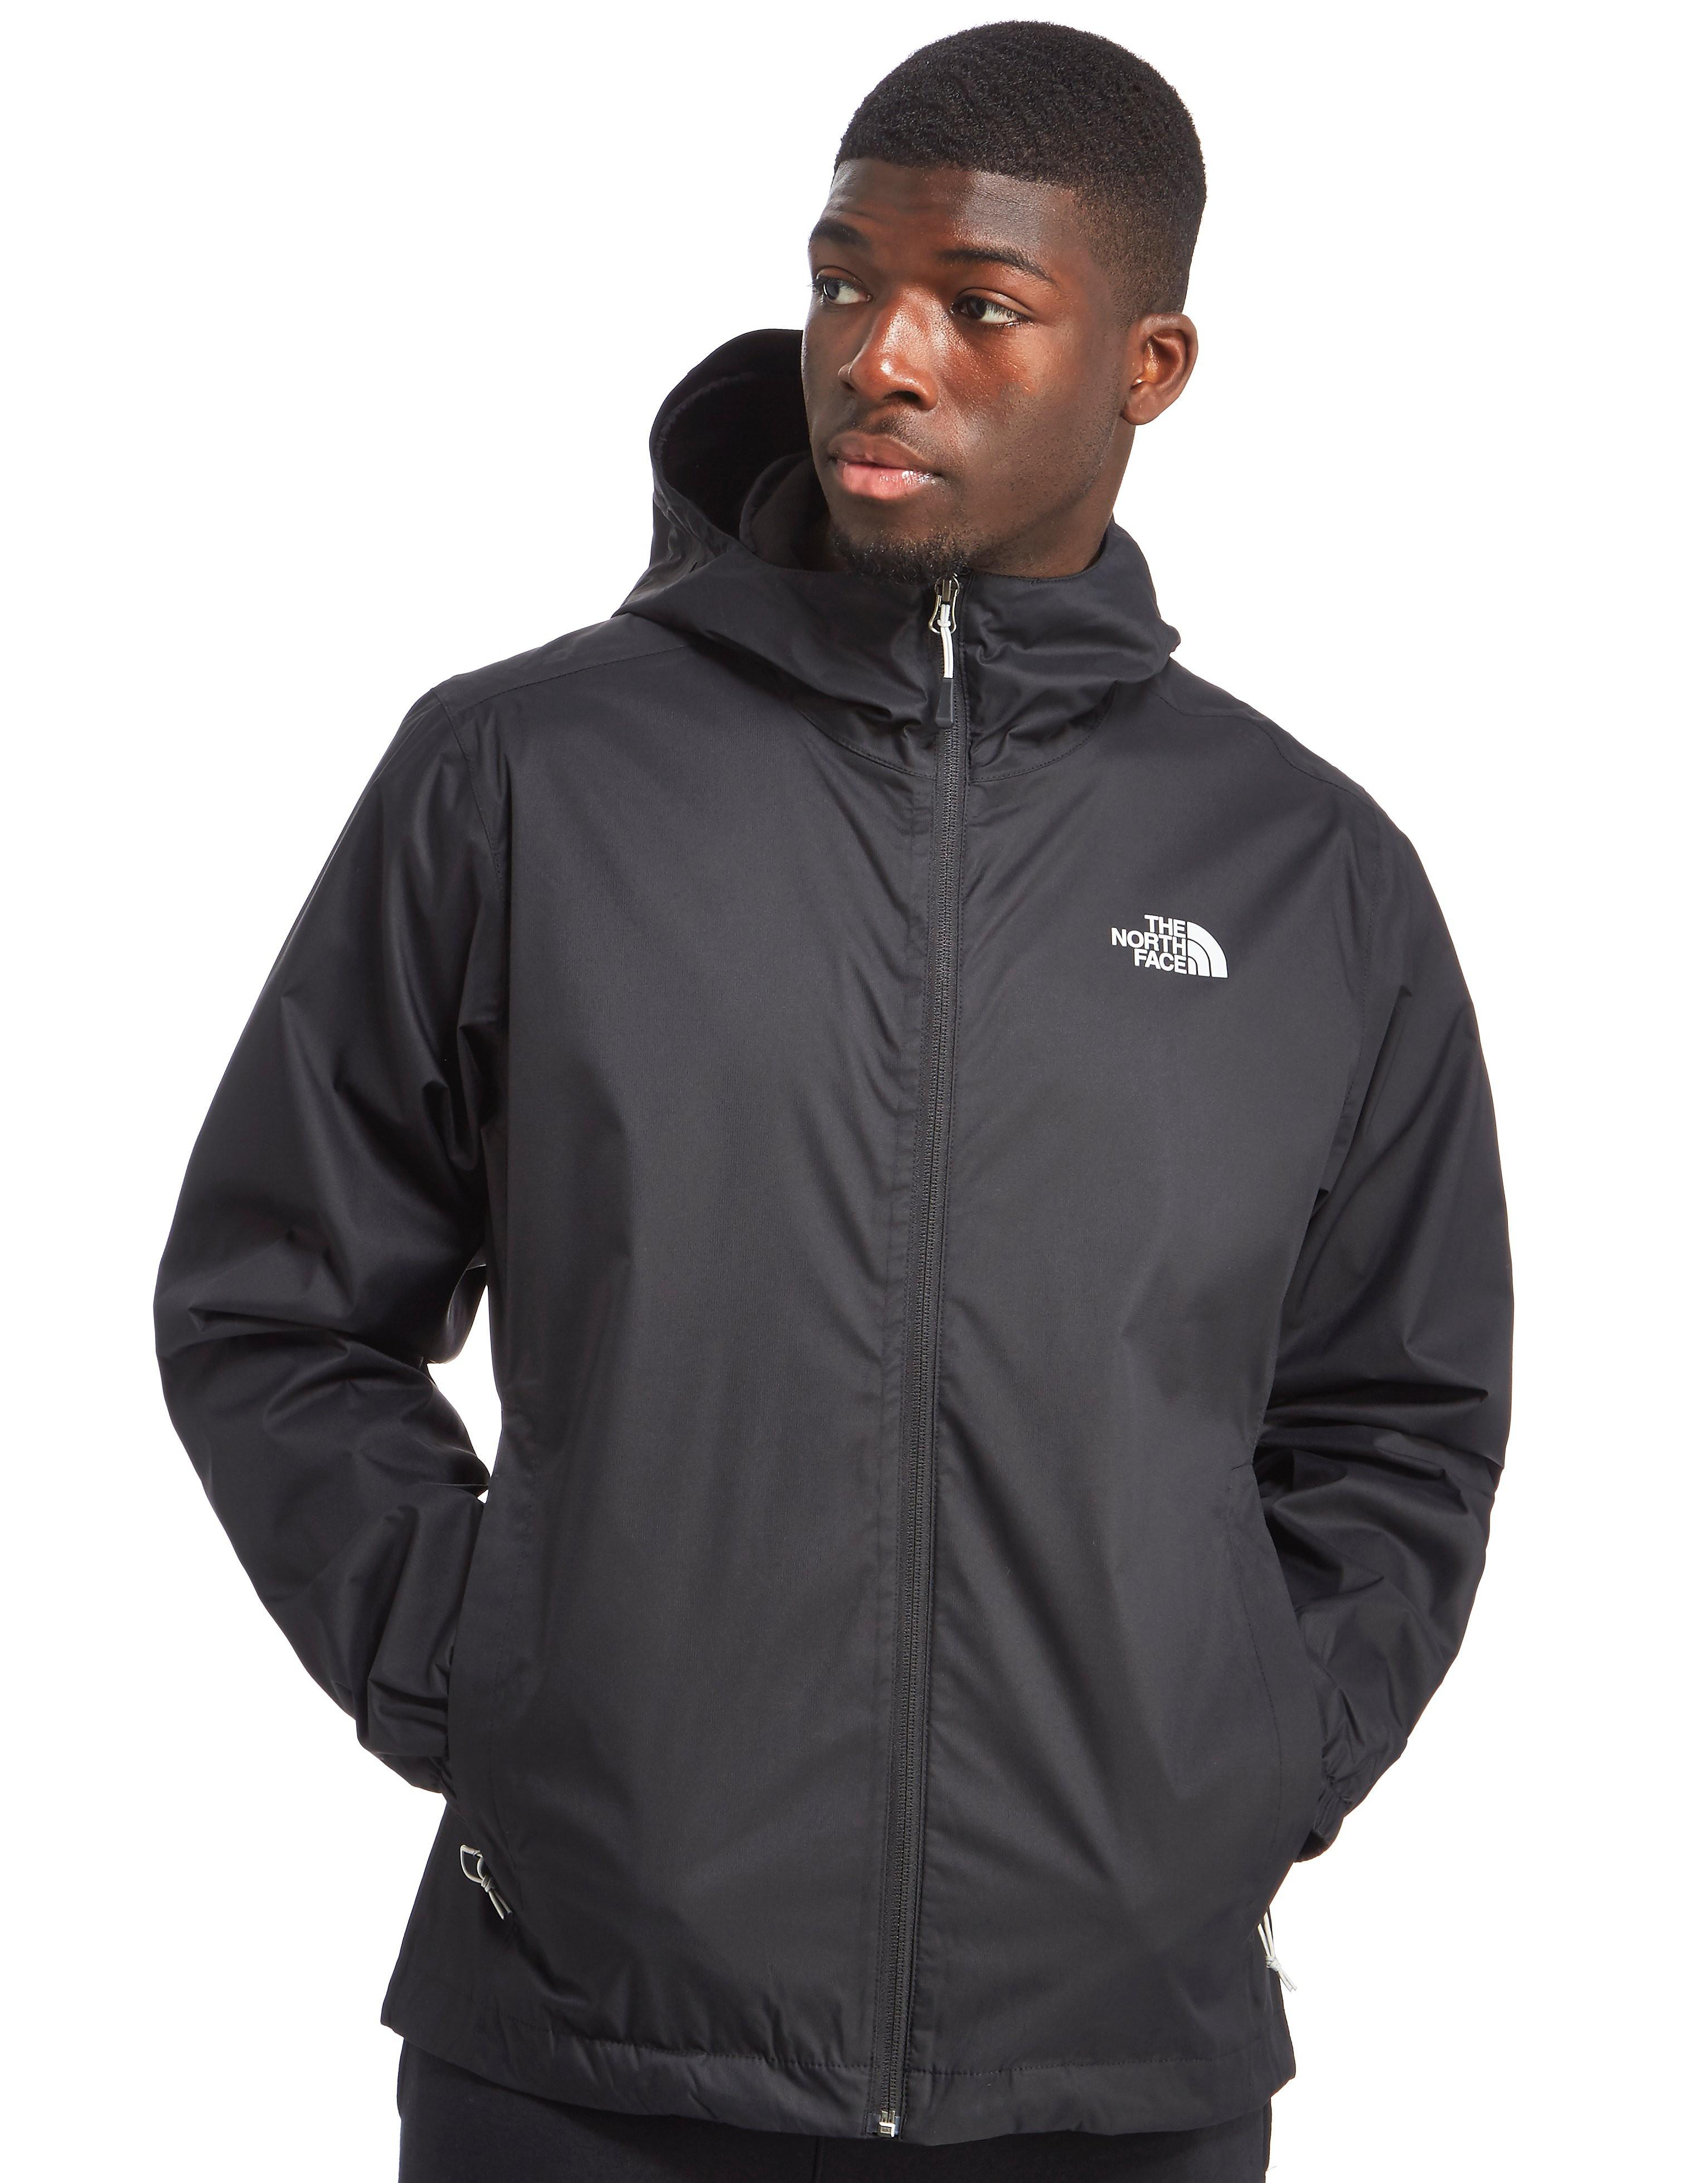 Northface Jacket Mens